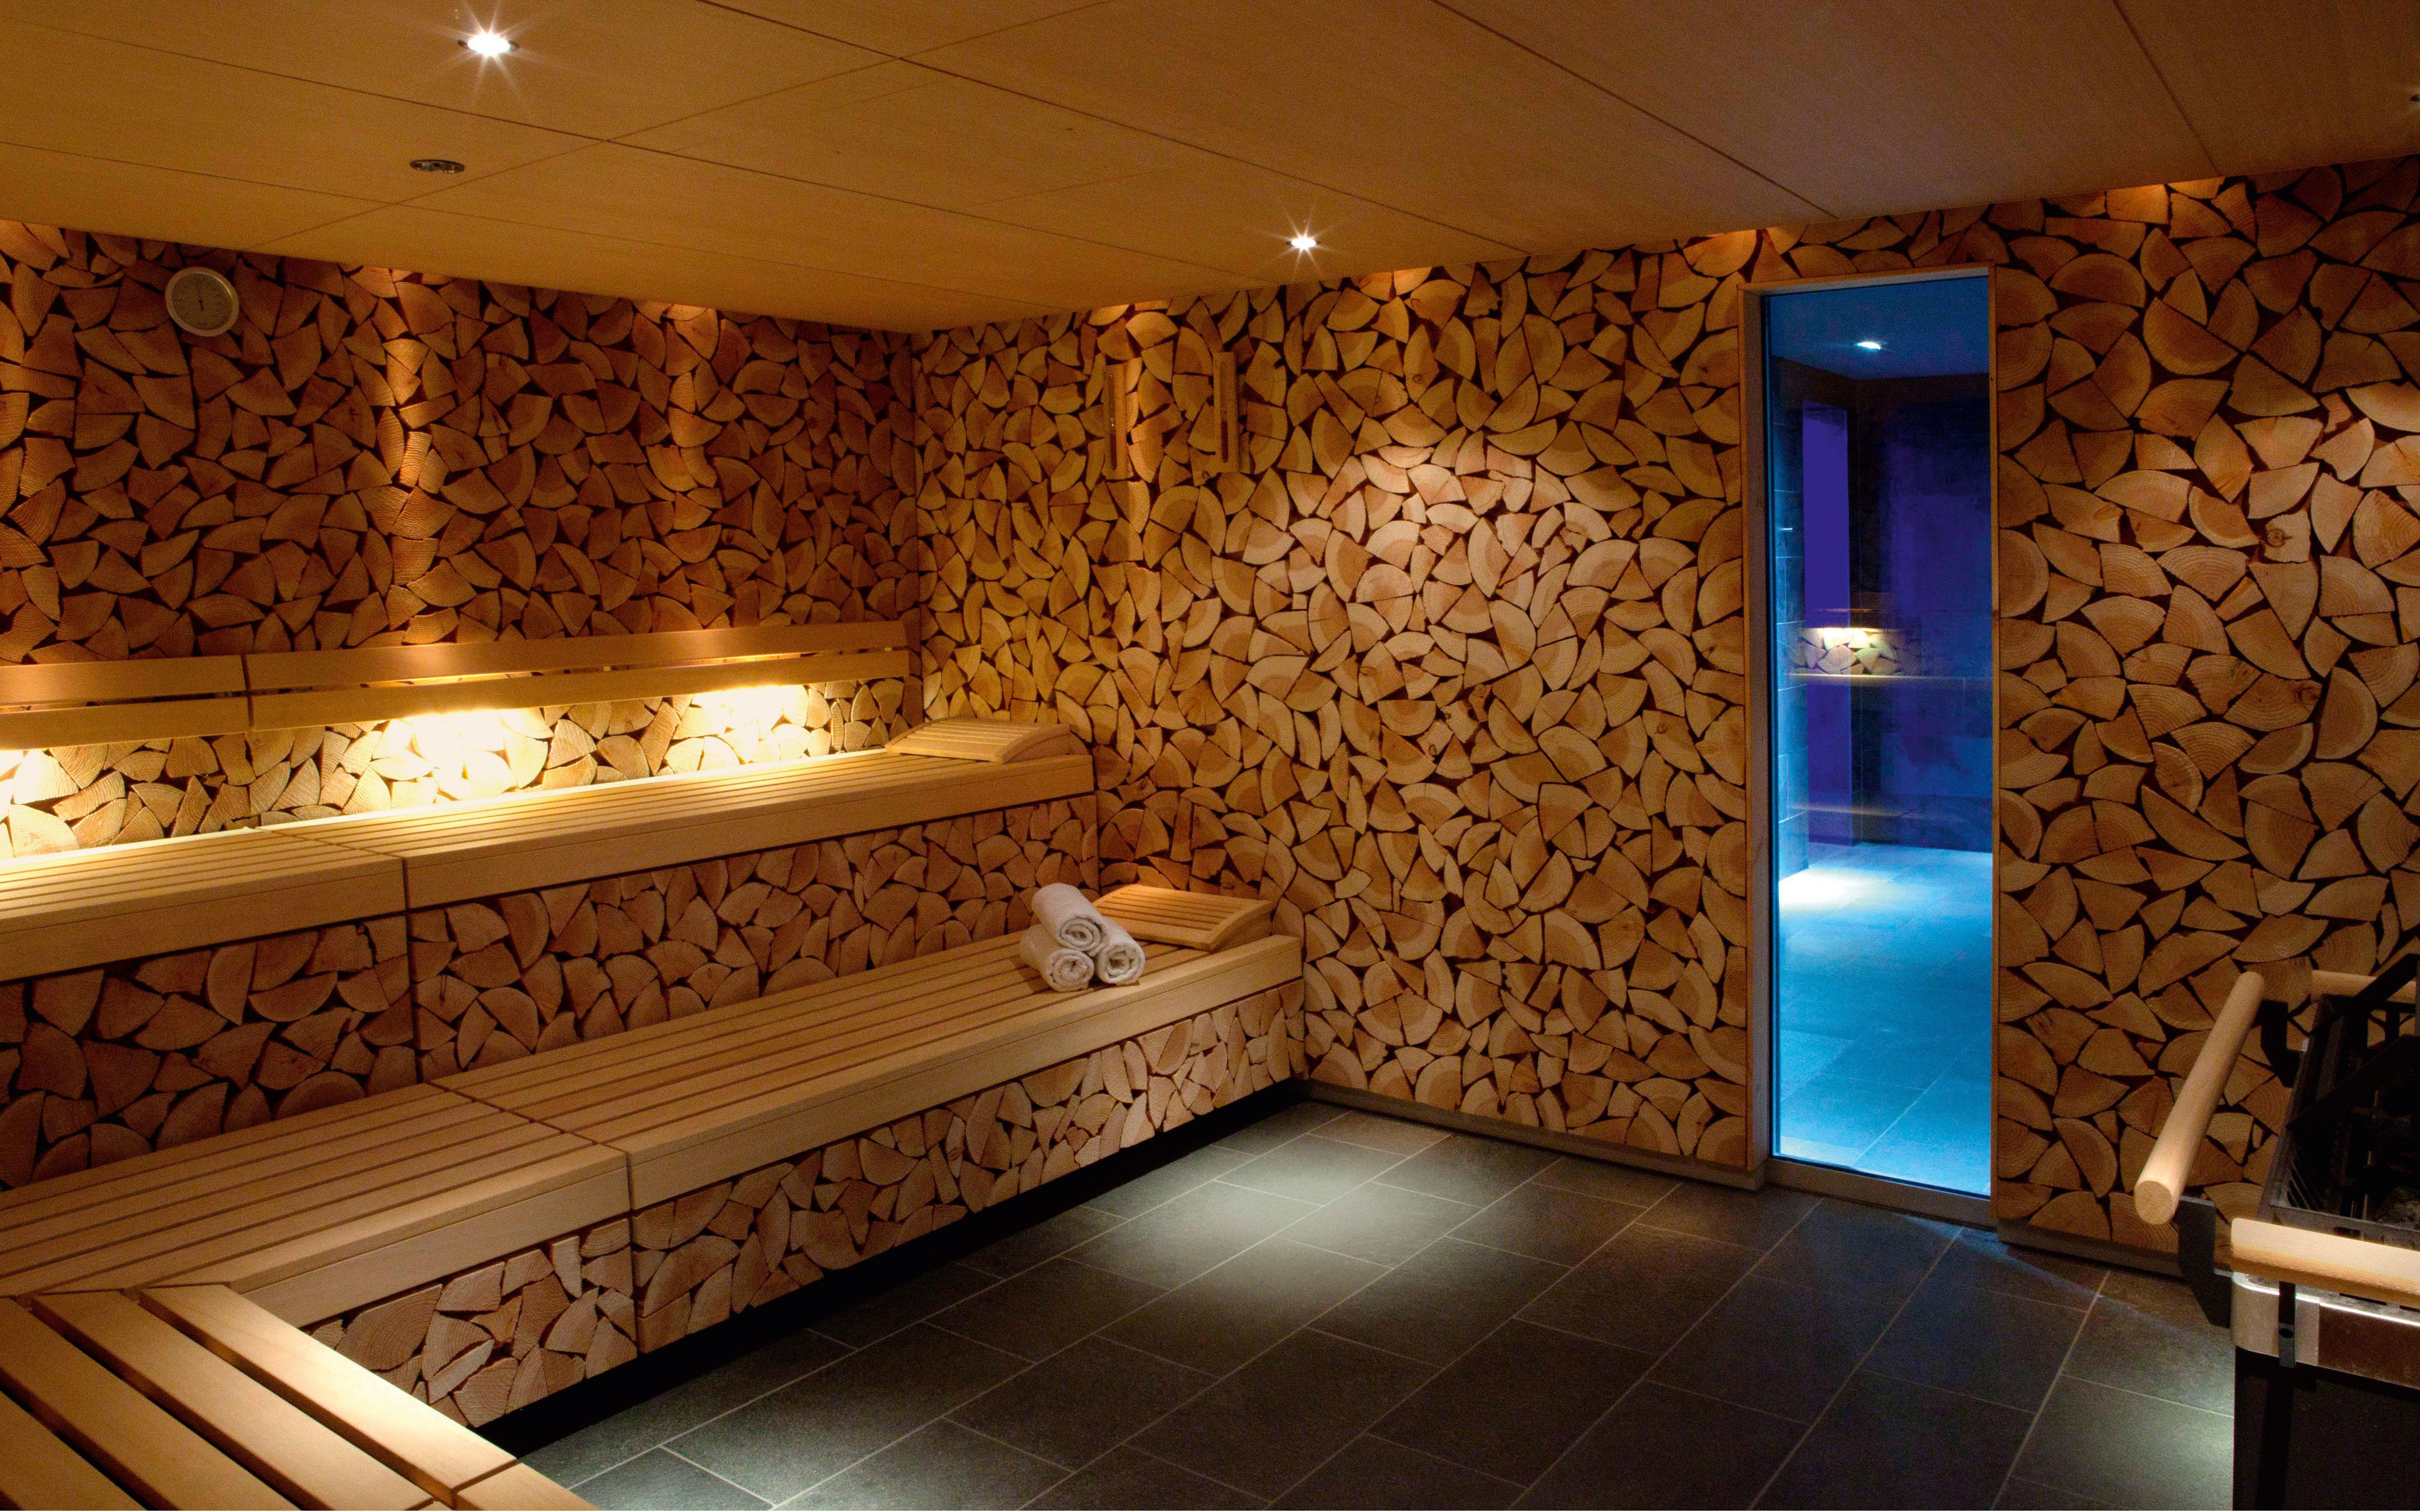 Sauna Spa Beauty Highlights Sauna Sauna Room Holmes Place